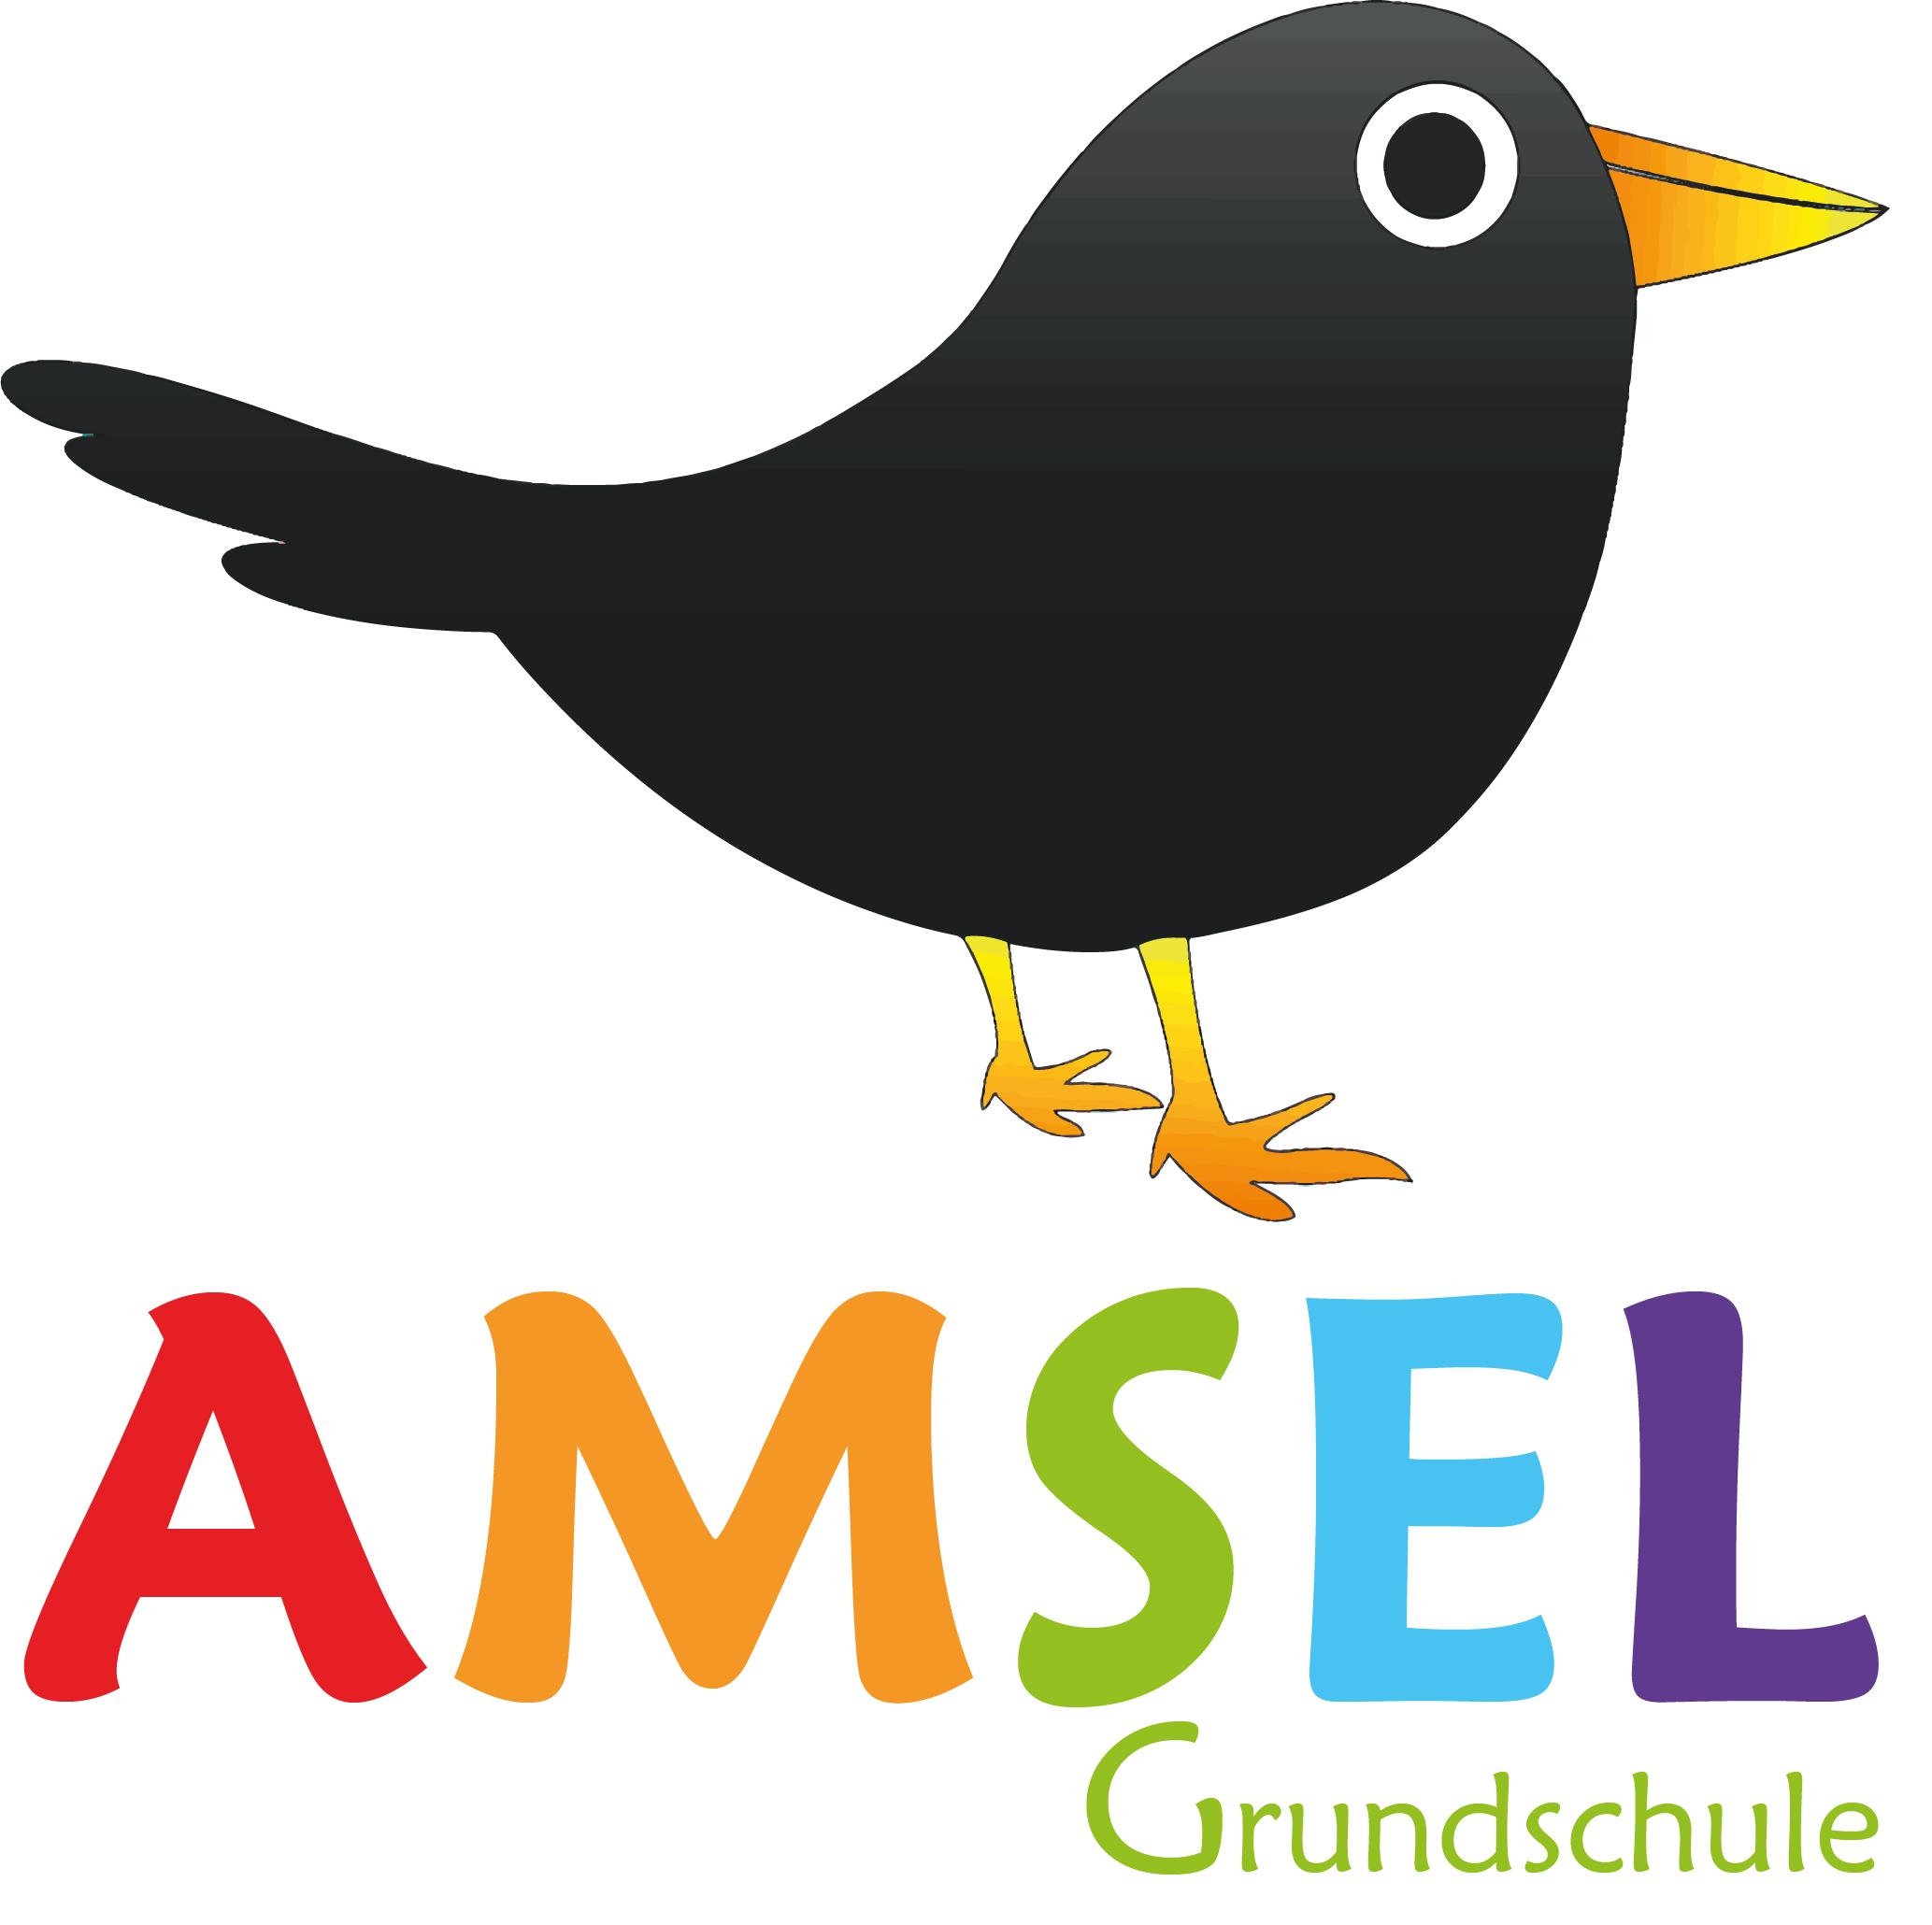 AMSEL Schule